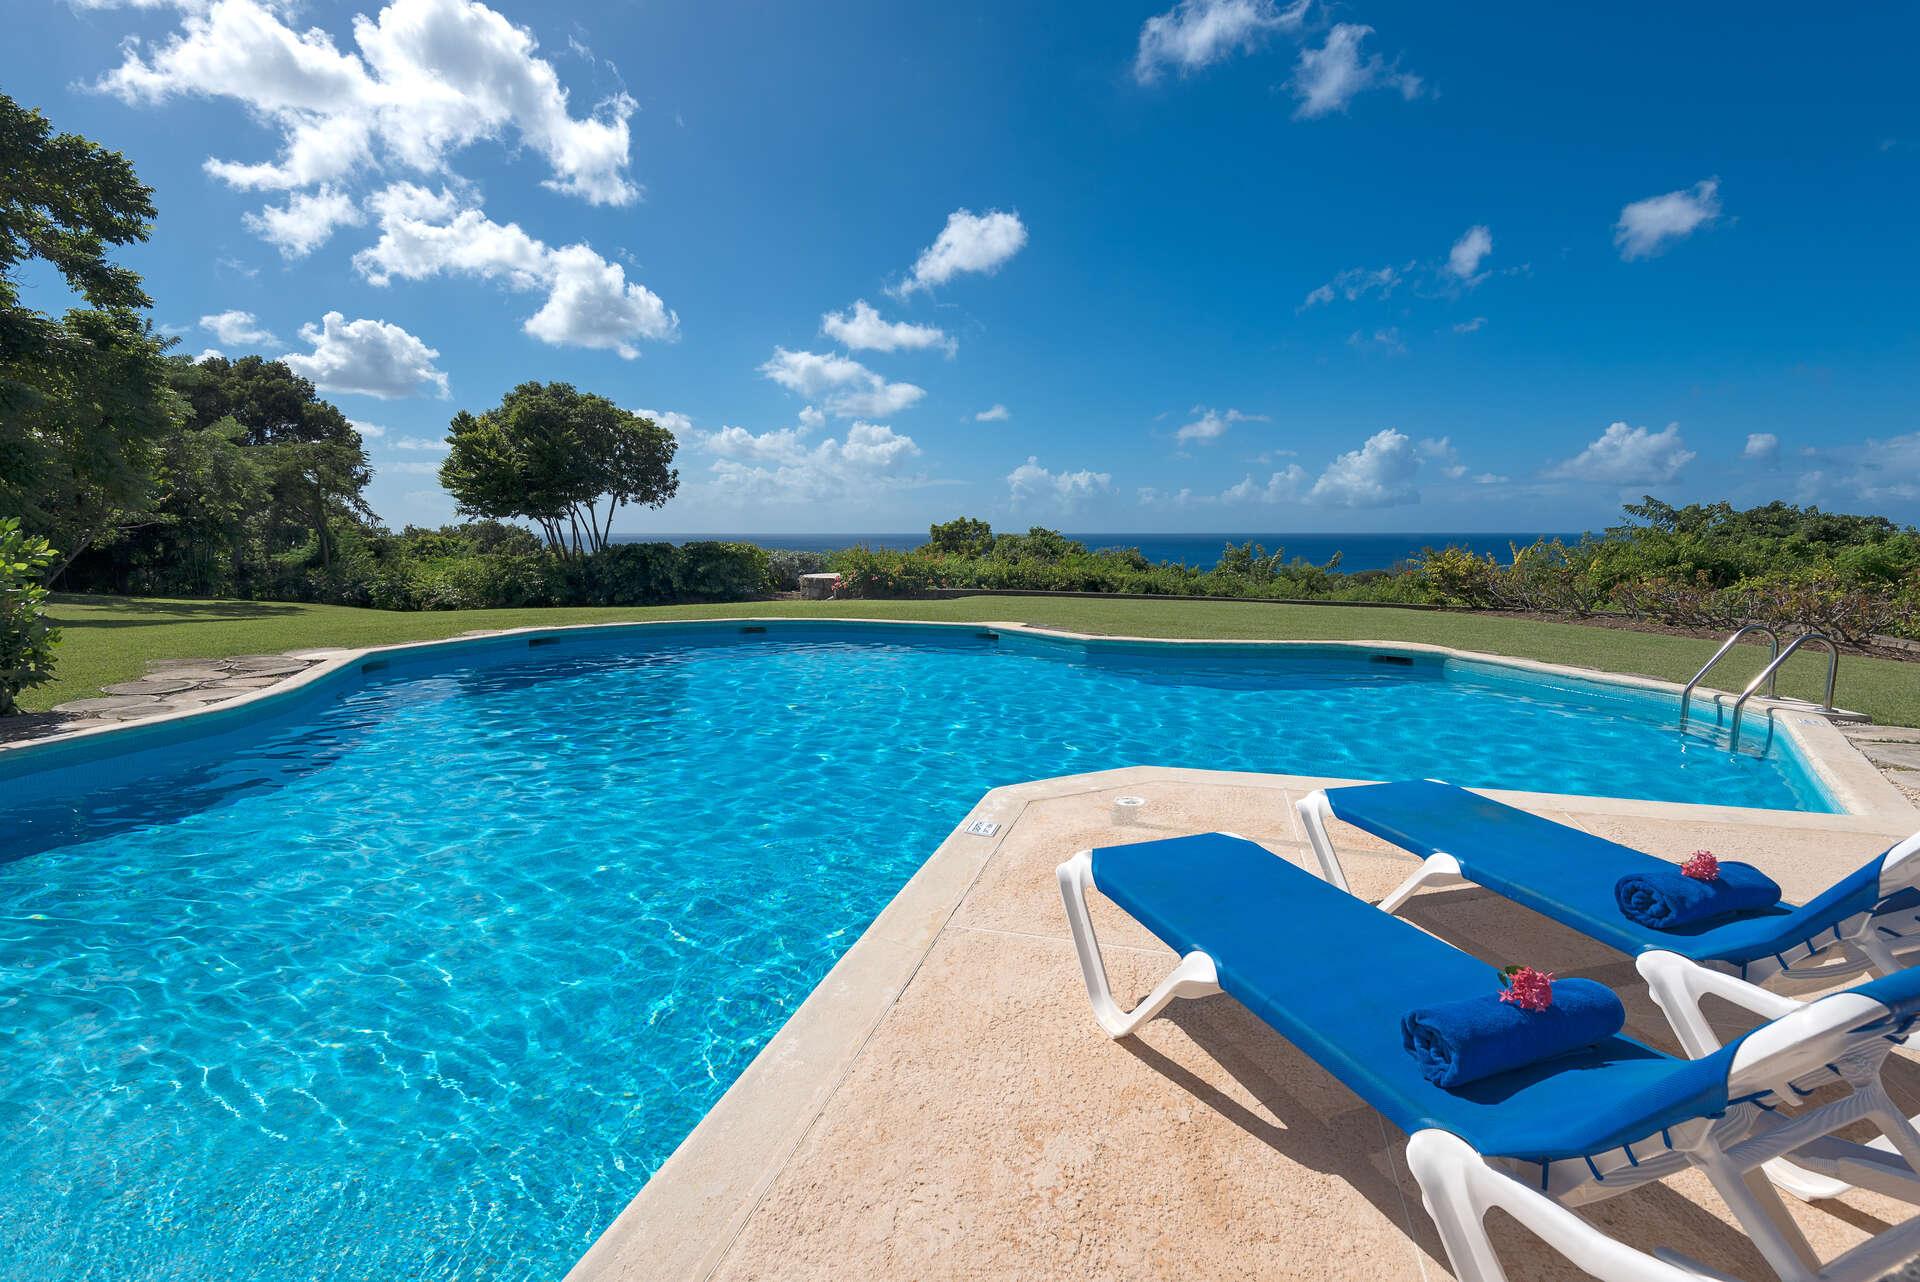 Luxury villa rentals caribbean - Barbados - St james - Polo ridge - San Flamingo - Image 1/11